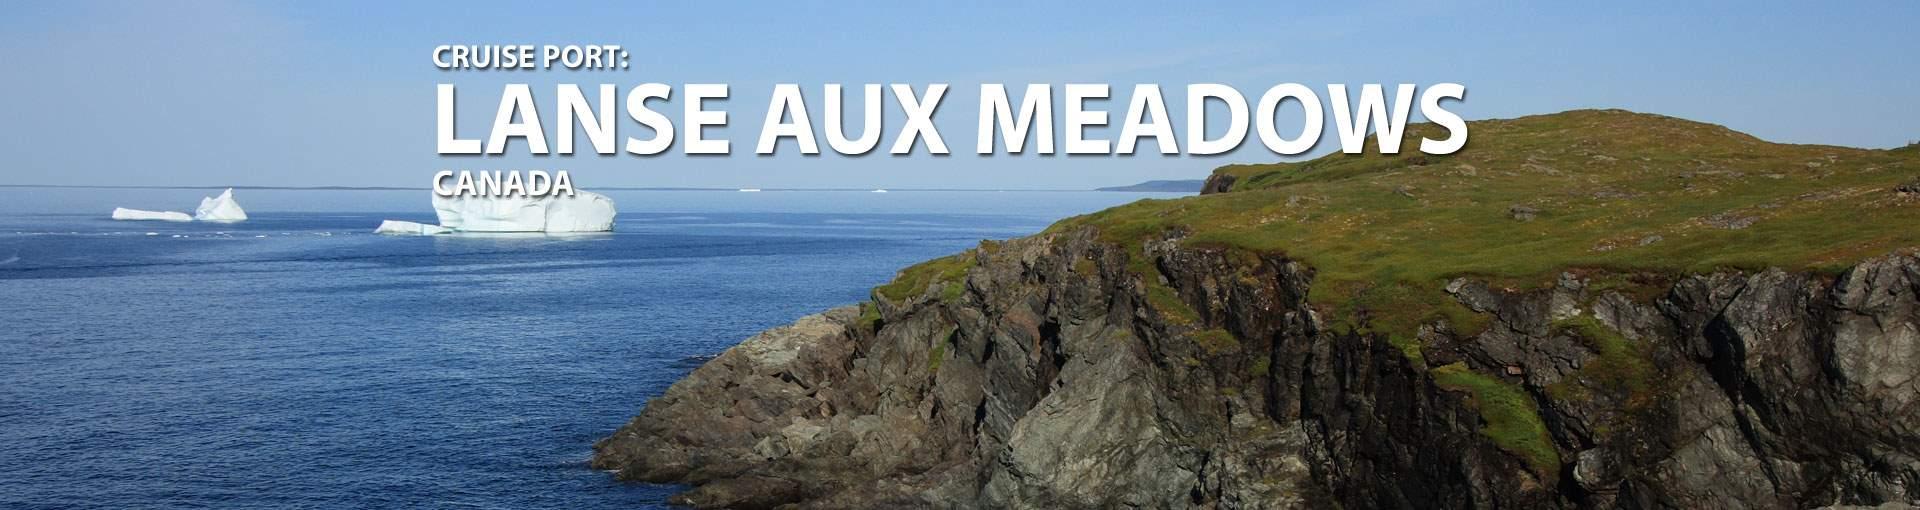 Lanse Aux Meadows, Newfoundland Cruise Port